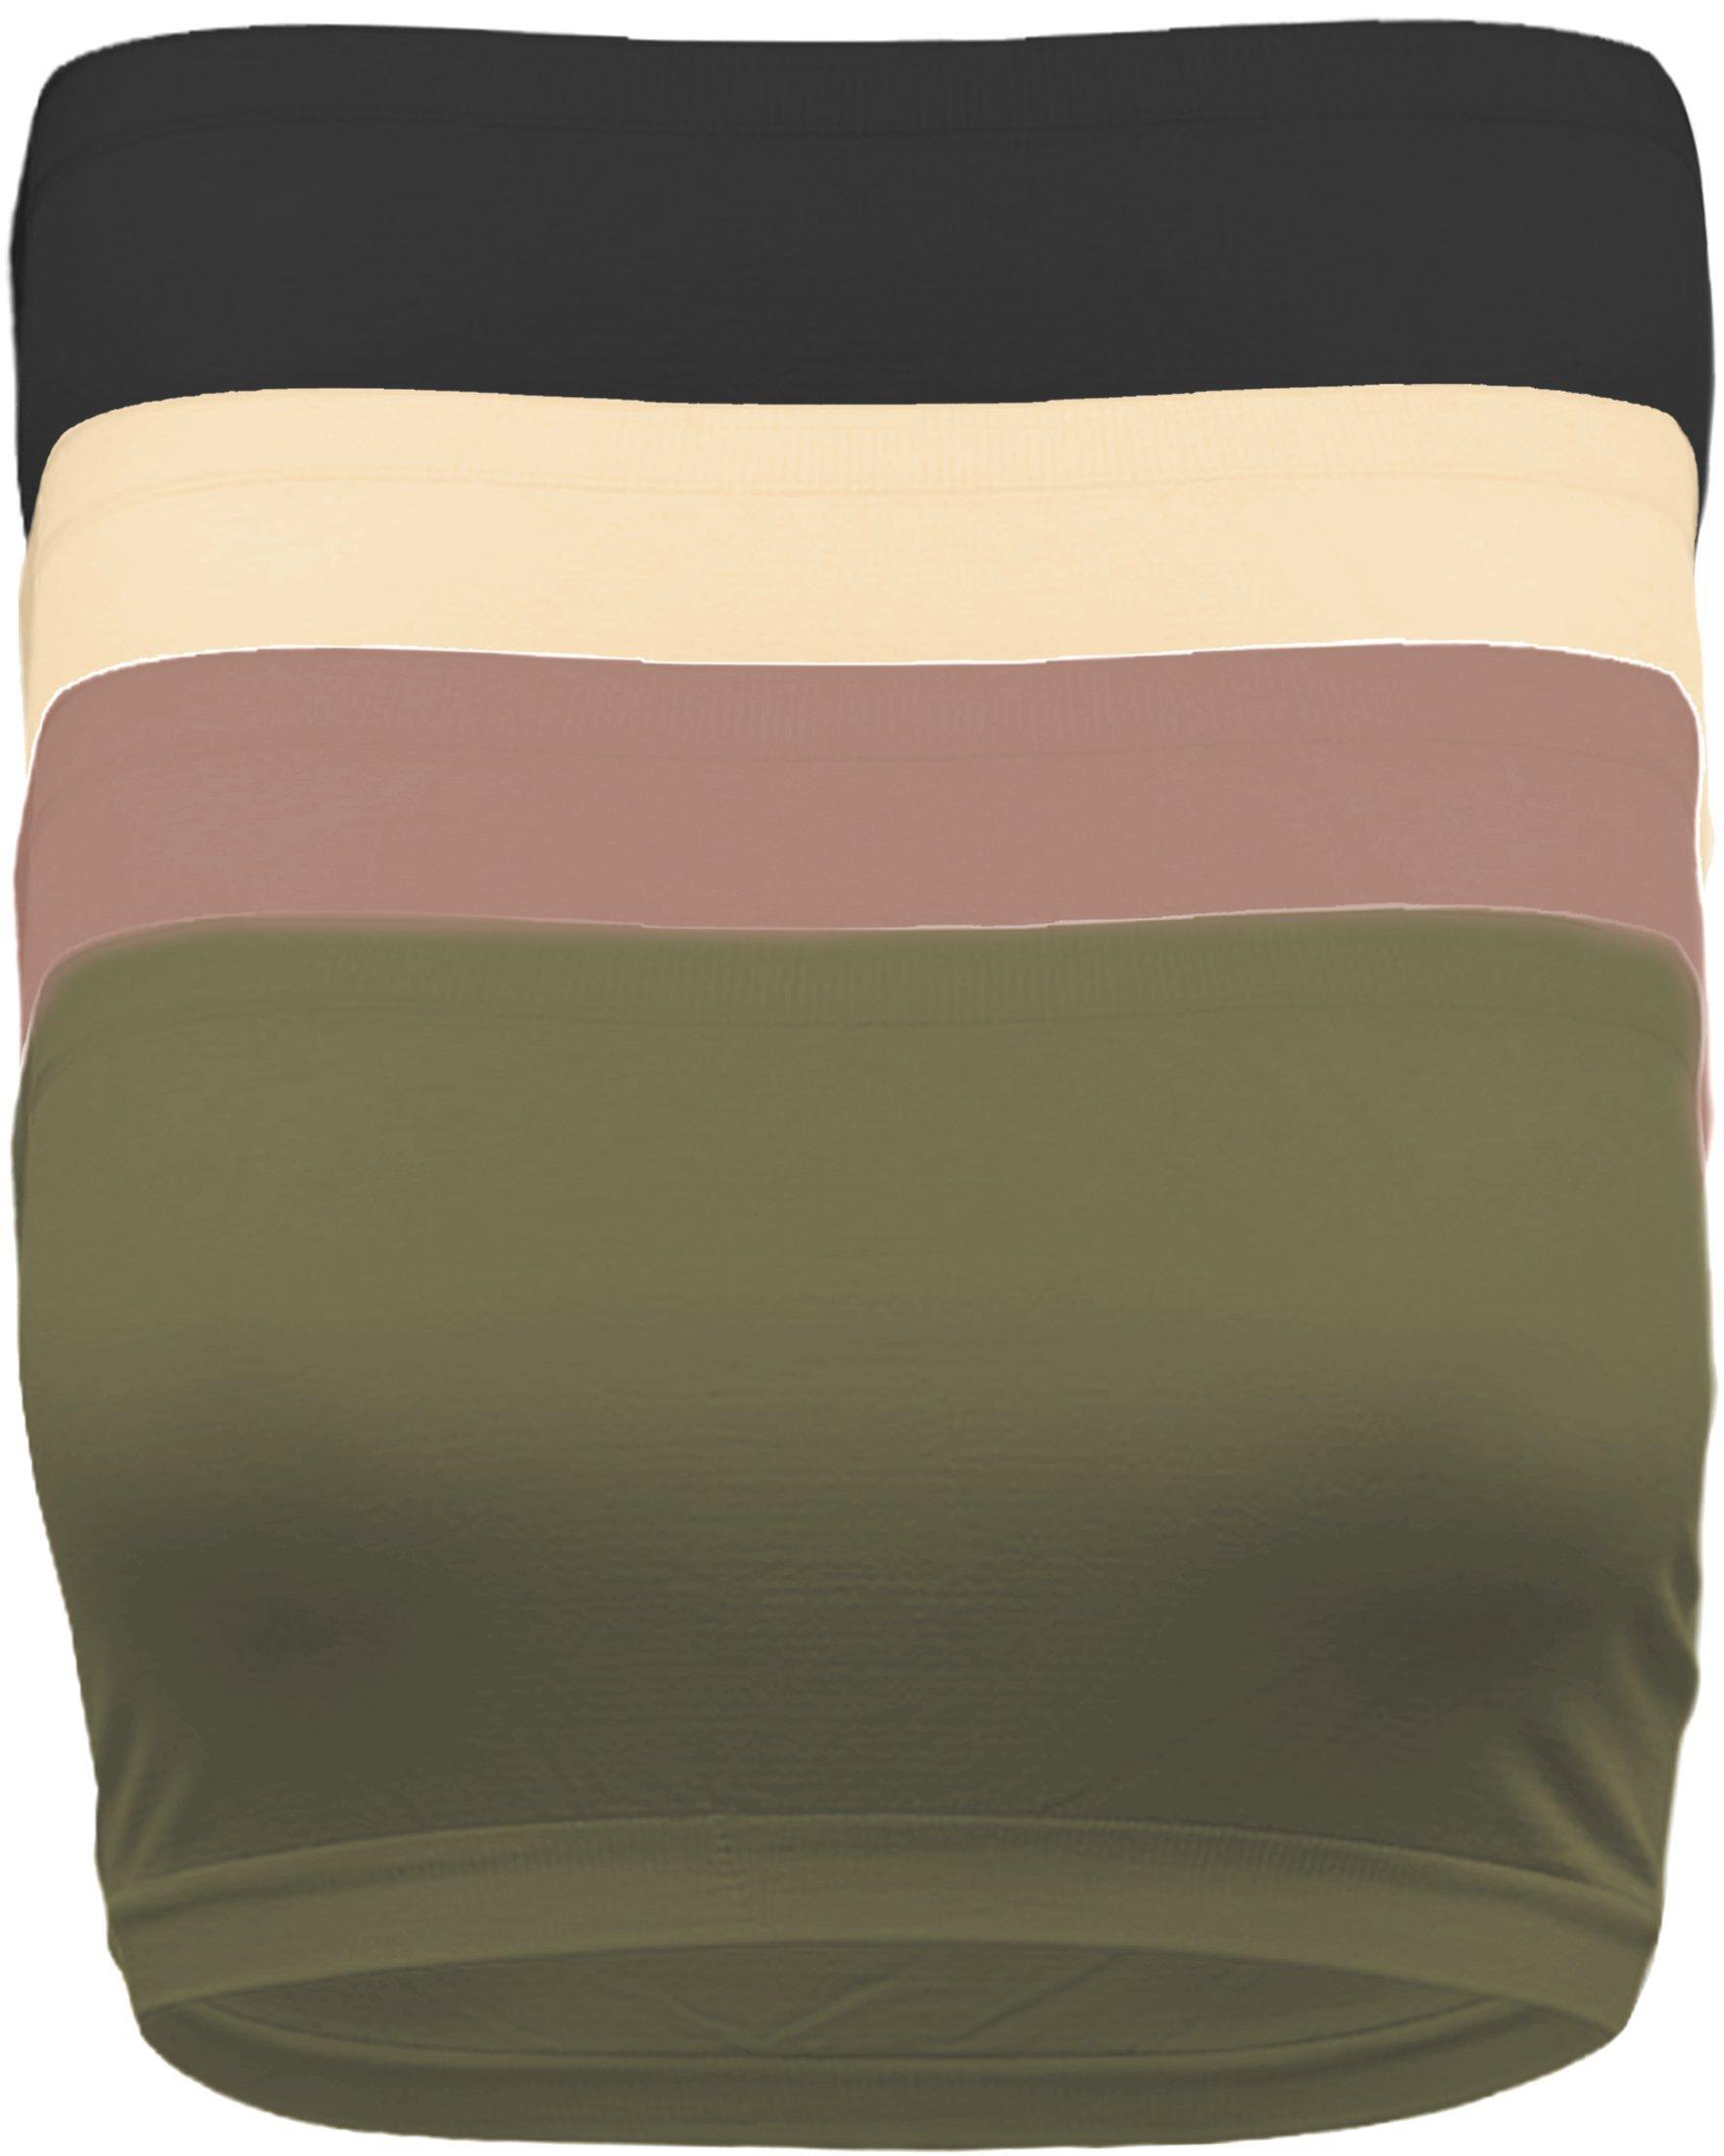 Ollie Arnes Curvy Women's Plus Size Non Padded Stretchy Soft Tube Top Bandeu Bra PLUSSIZE BK_Nude_OLV_MVE-Plus